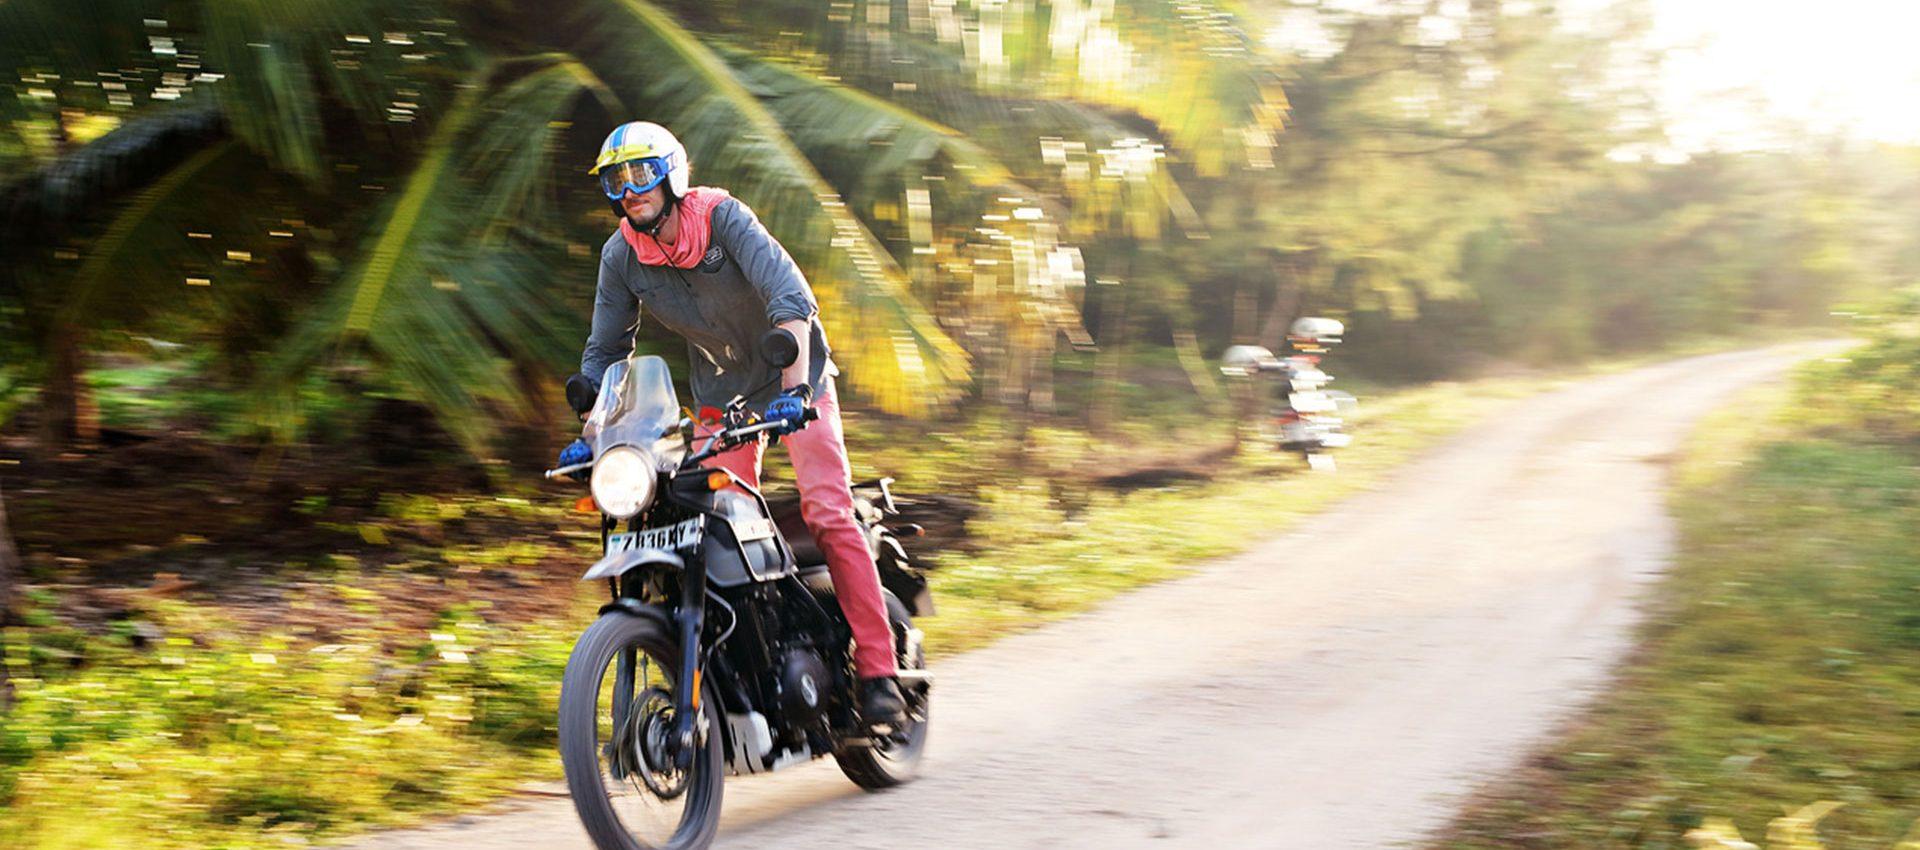 Riding between palm trees in Zanzibar.